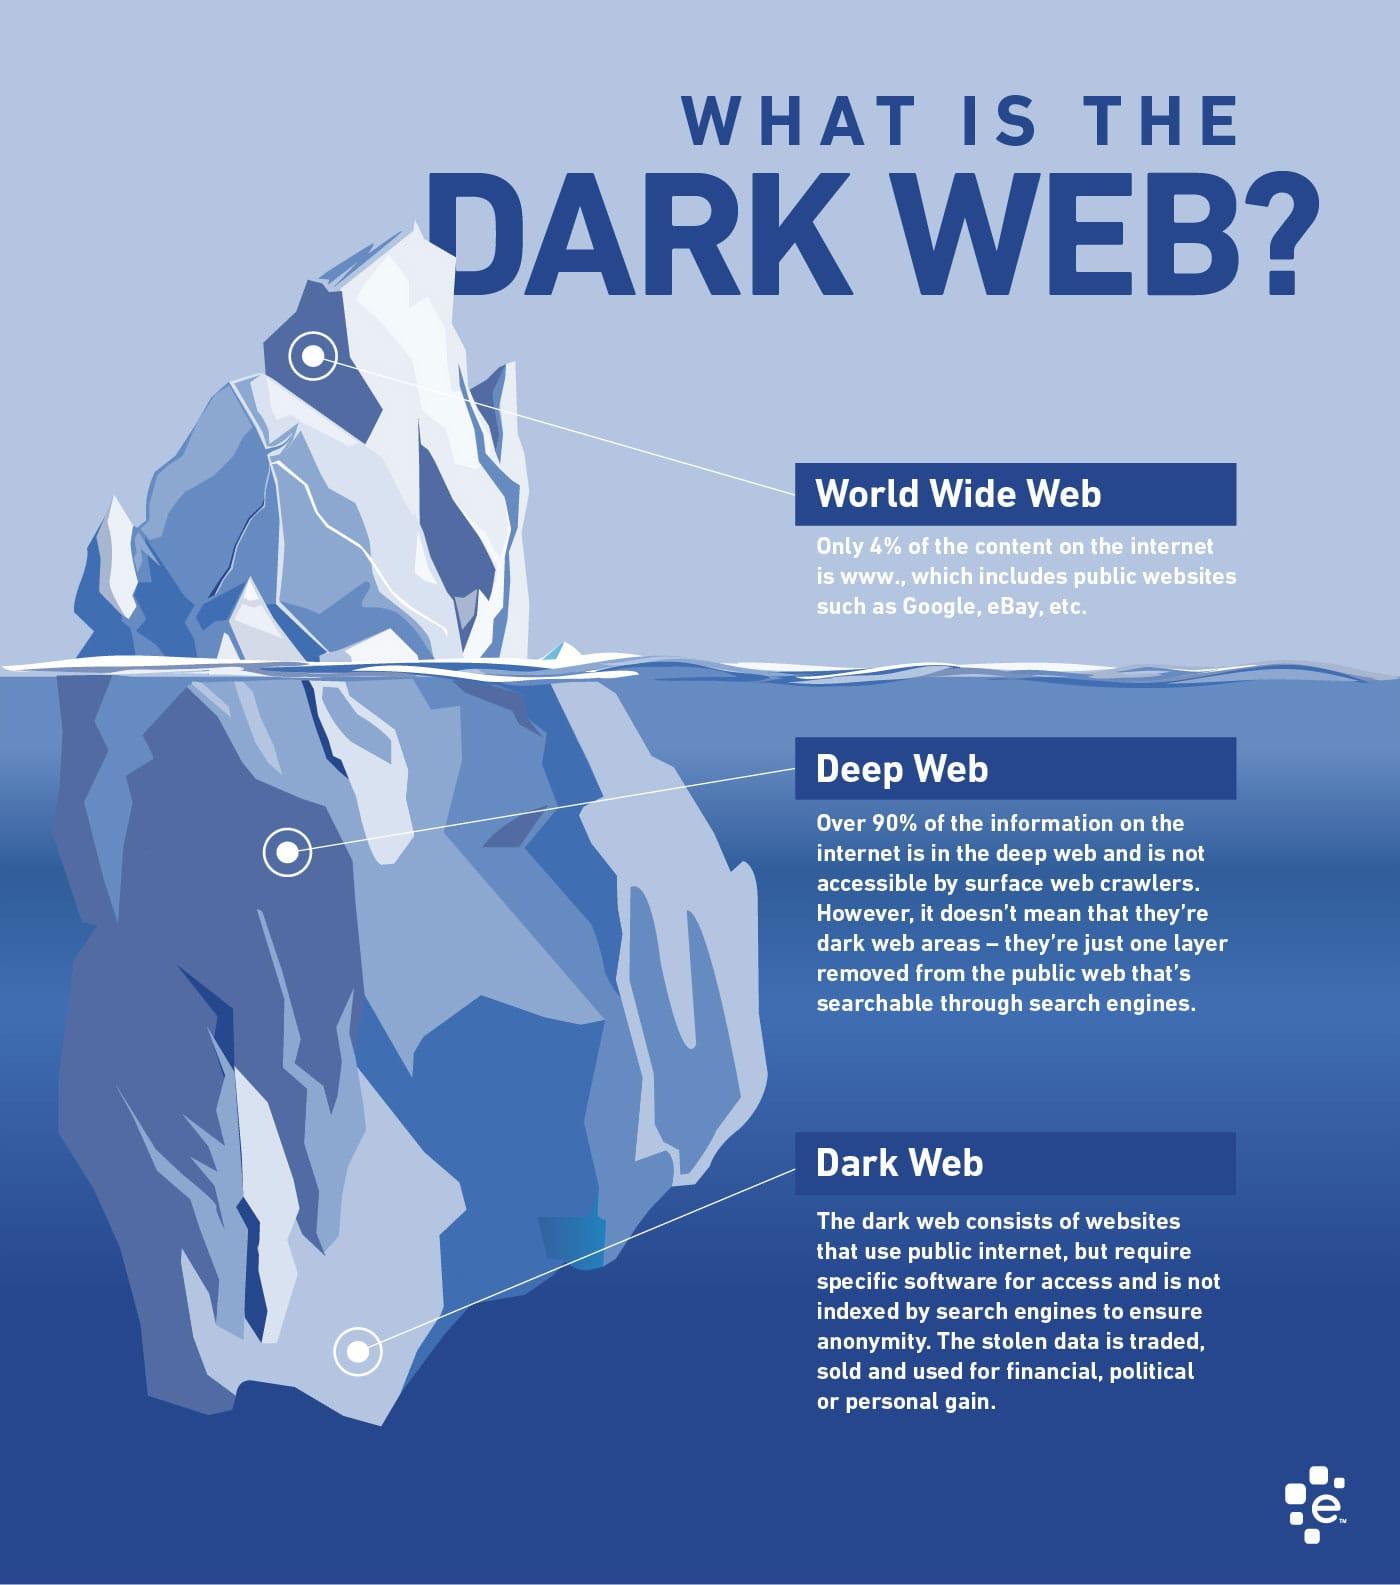 dark-web-infographic.jpg